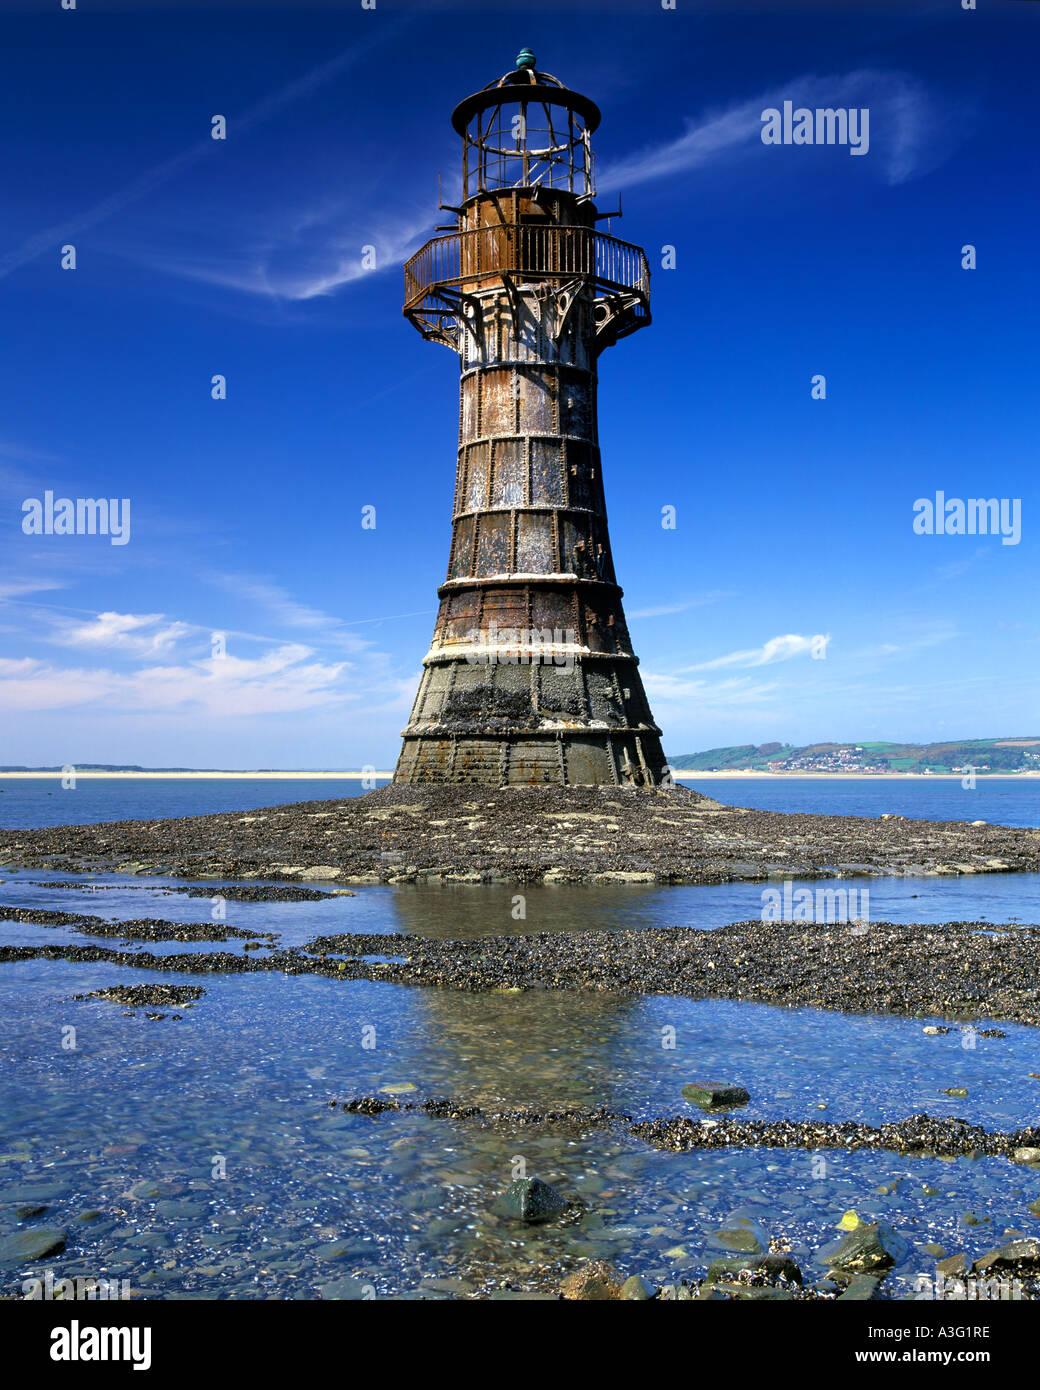 Punto Whiteford faro, la península de Gower, South Wales, REINO UNIDO Imagen De Stock